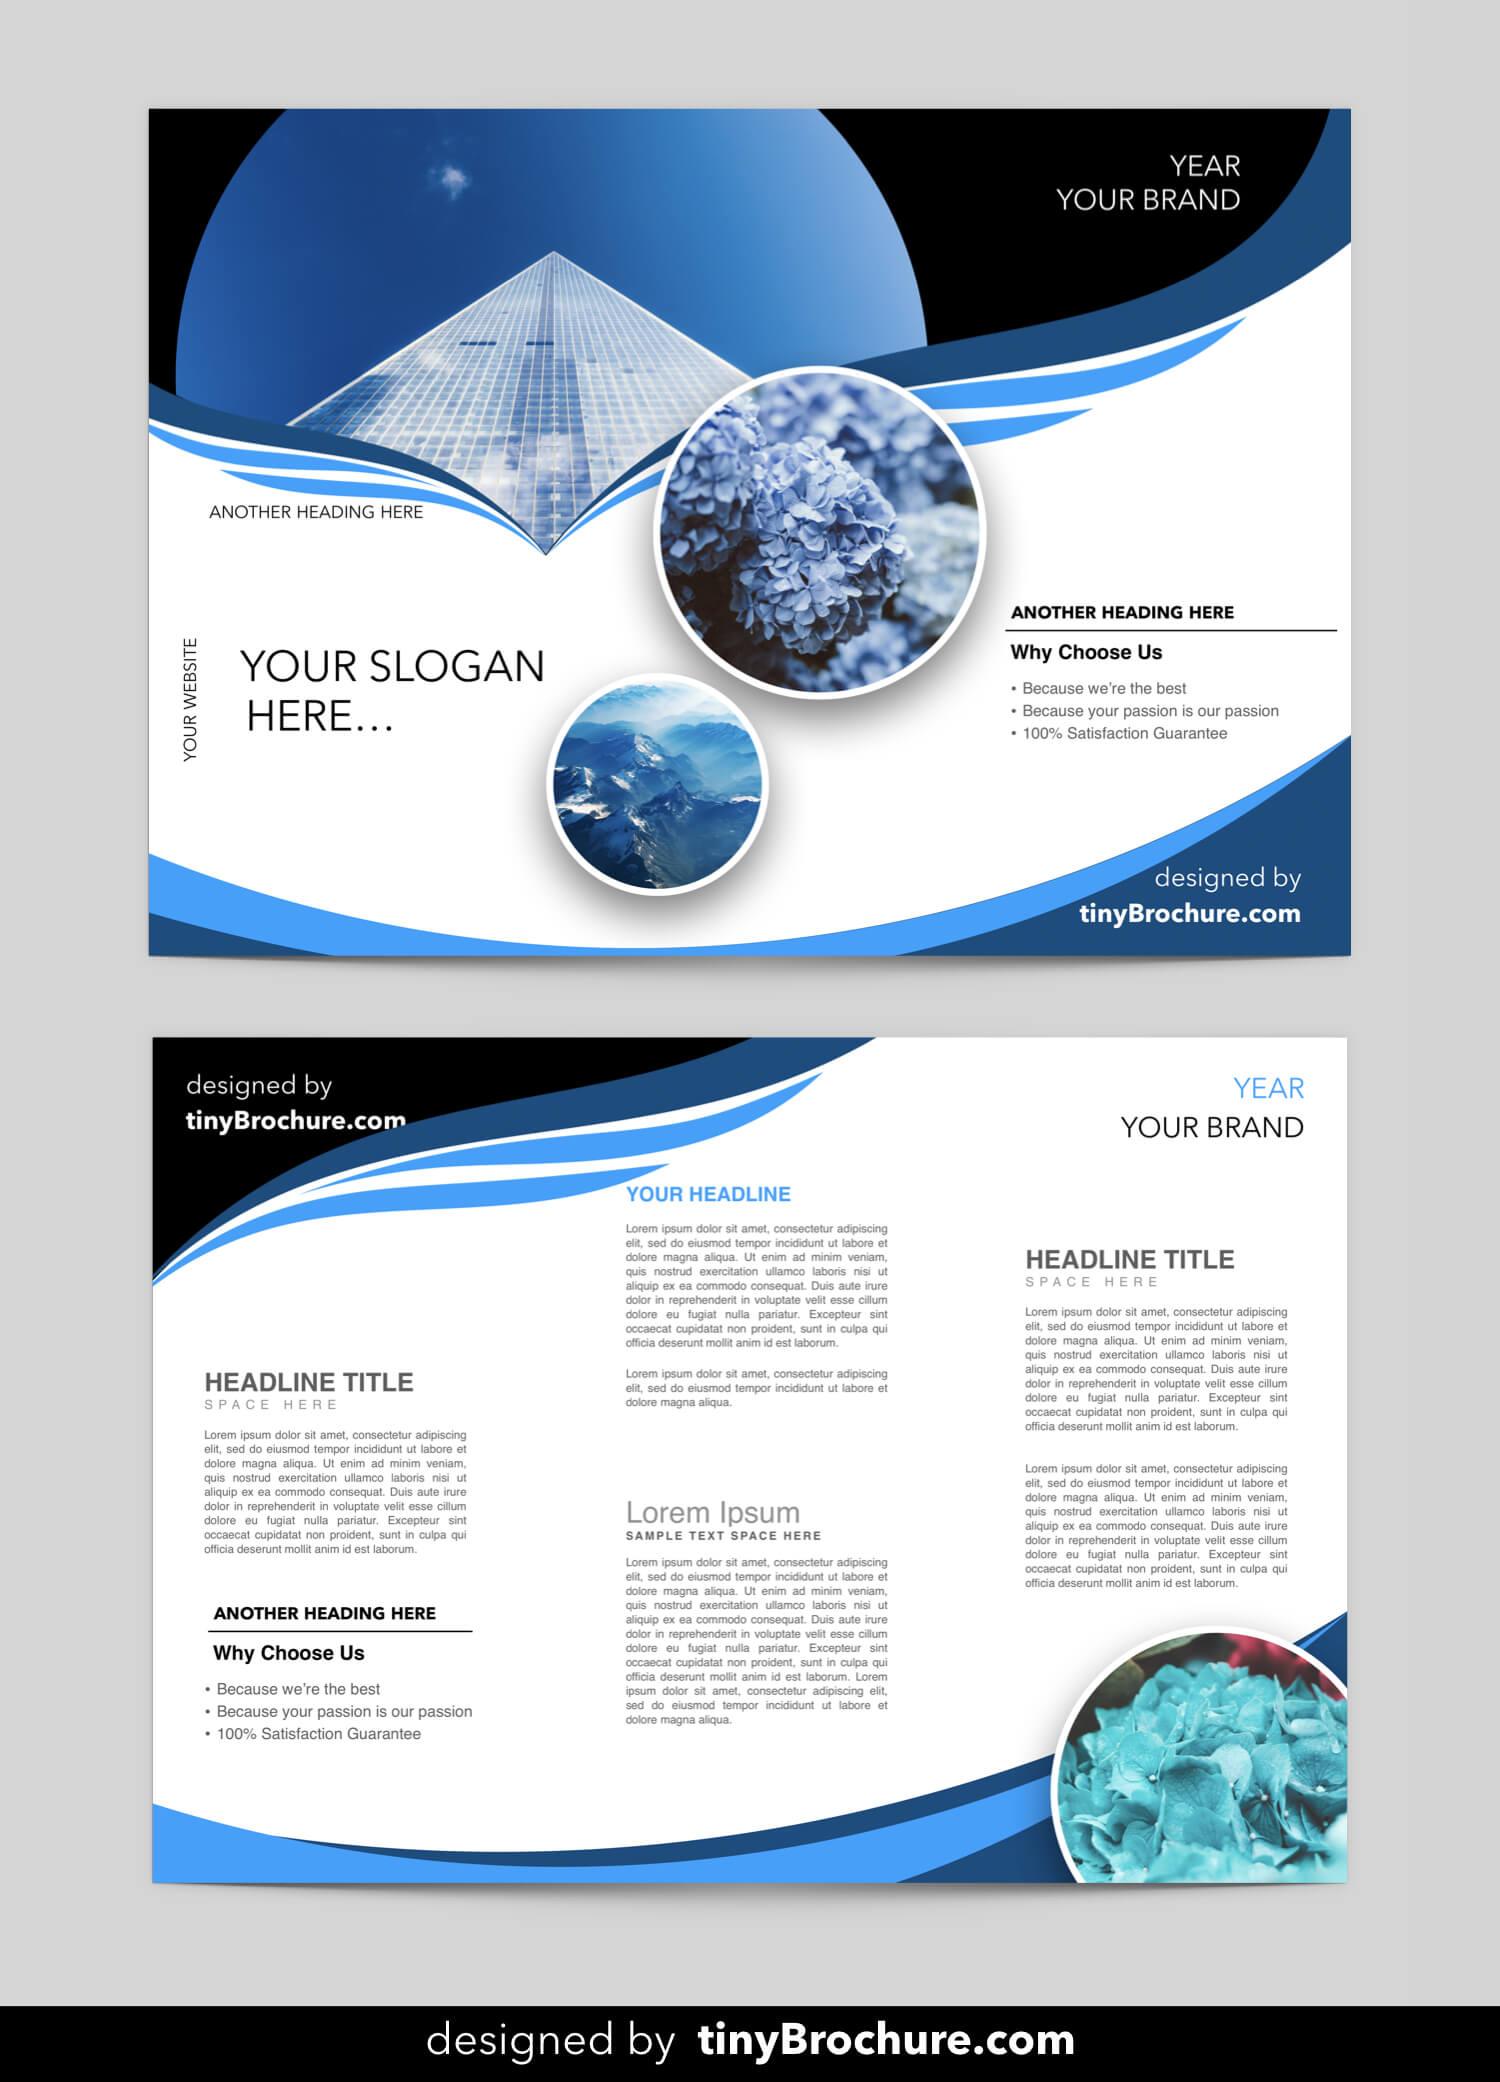 Editable Brochure Template Word Free Download | Brochure Pertaining To Free Brochure Template Downloads